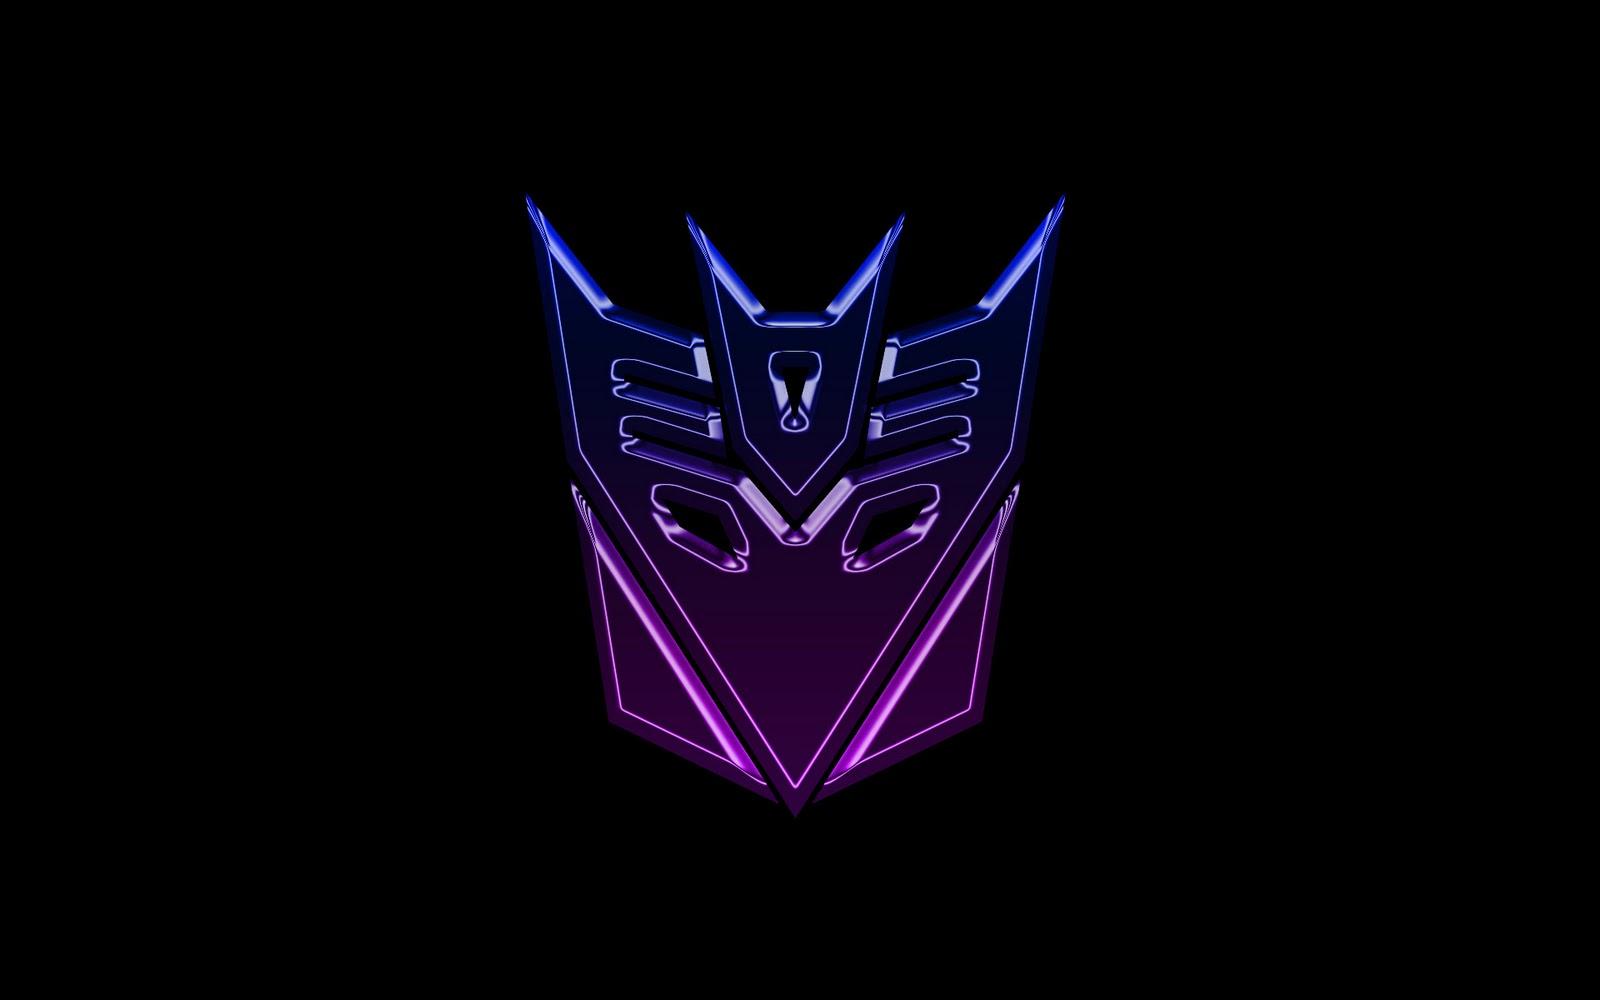 decepticon transformers decepticons logo 107723jpg 1600x1000